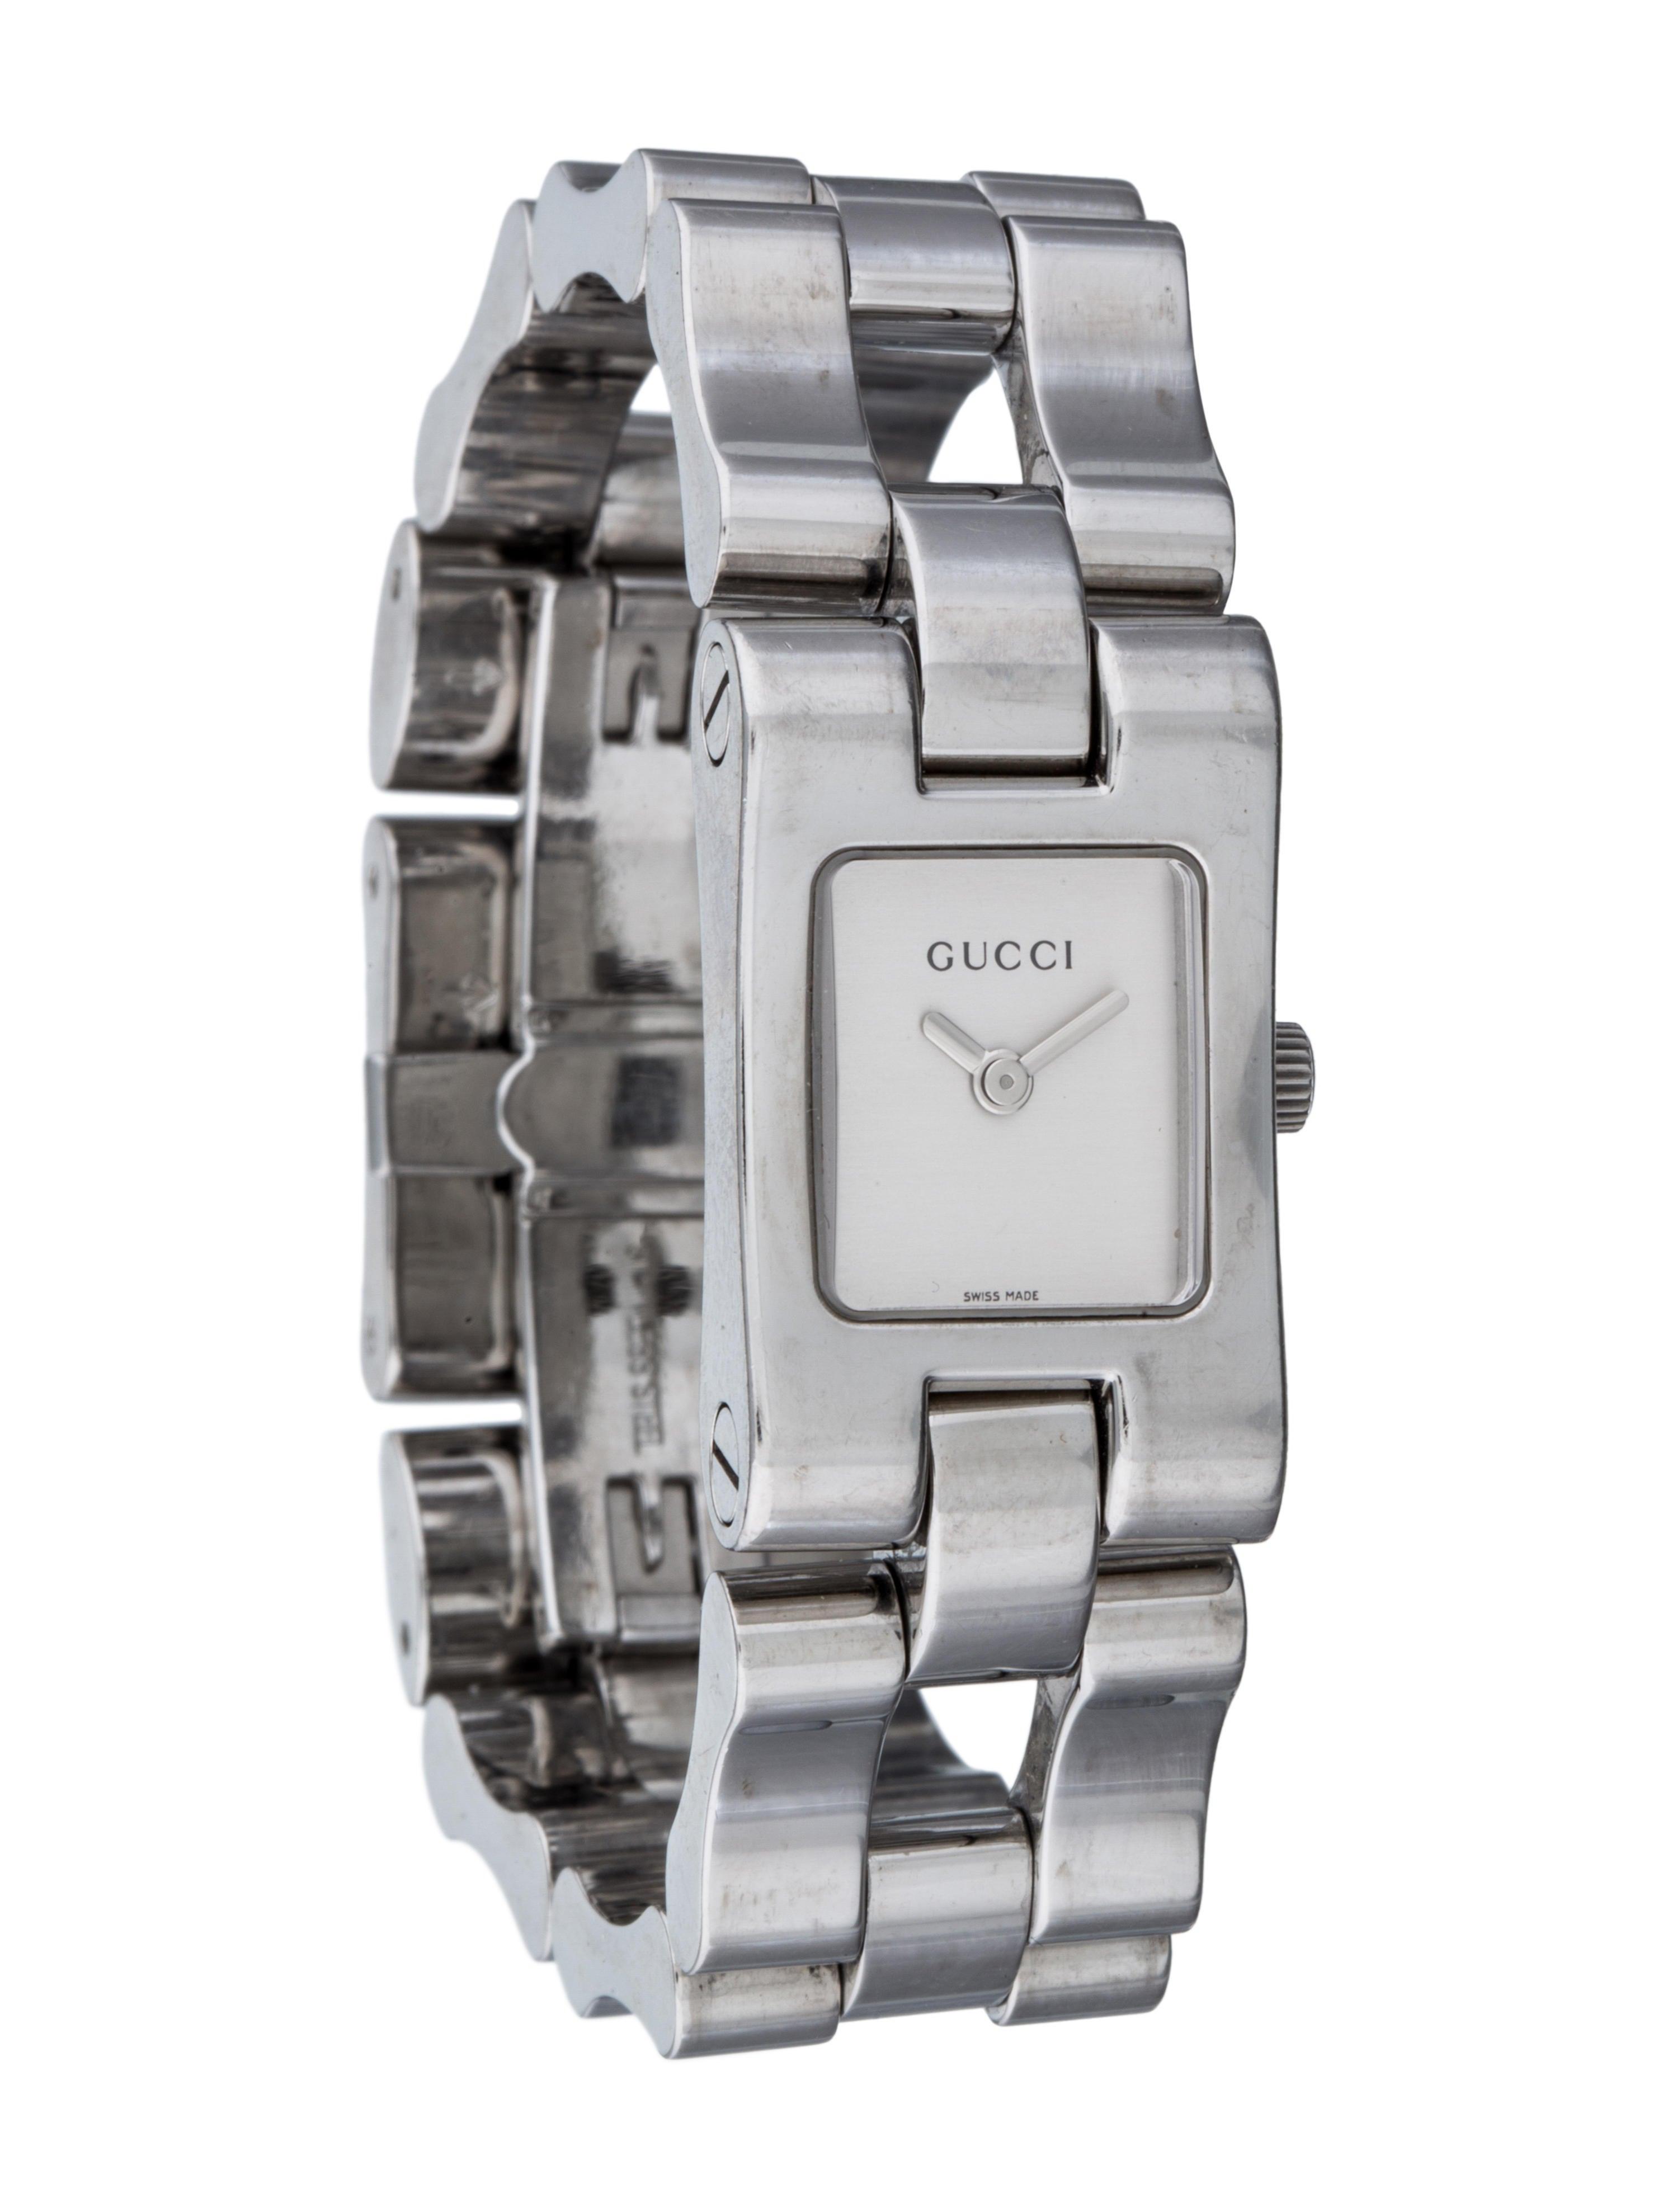 eb86e9c8fad Gucci 2305L Quartz Watch - Bracelet - GUC63443